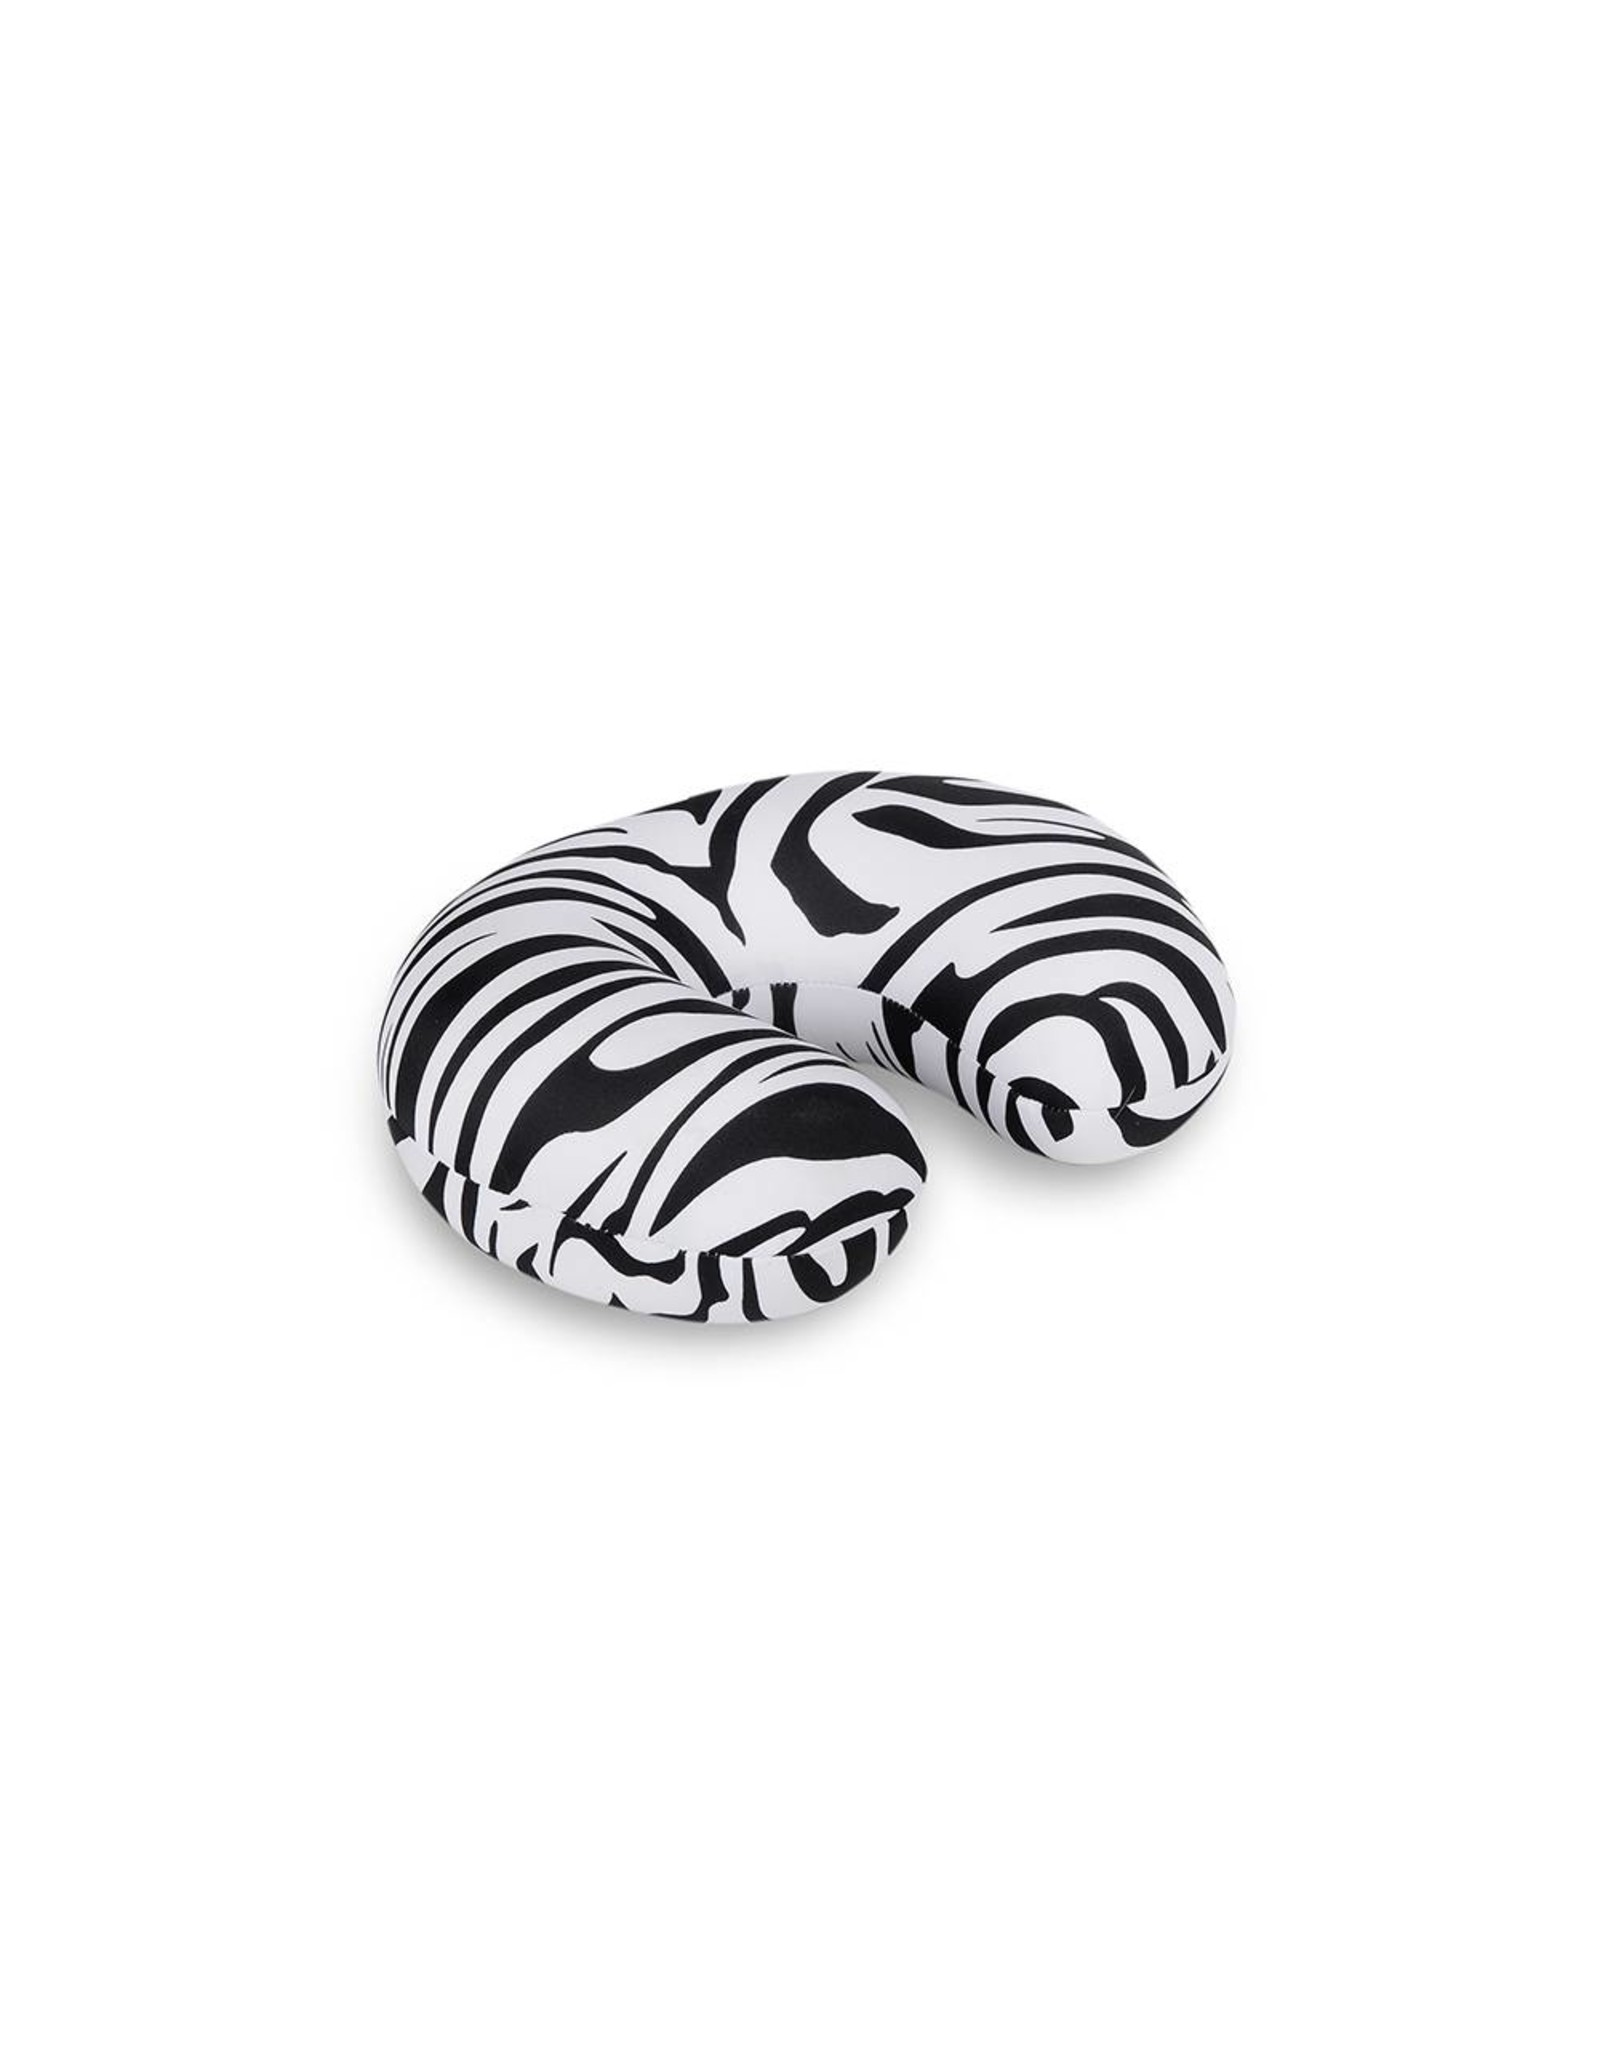 Kuschel-Maxx Kuschel-Maxx - Kindernackenhörnchen Zebra